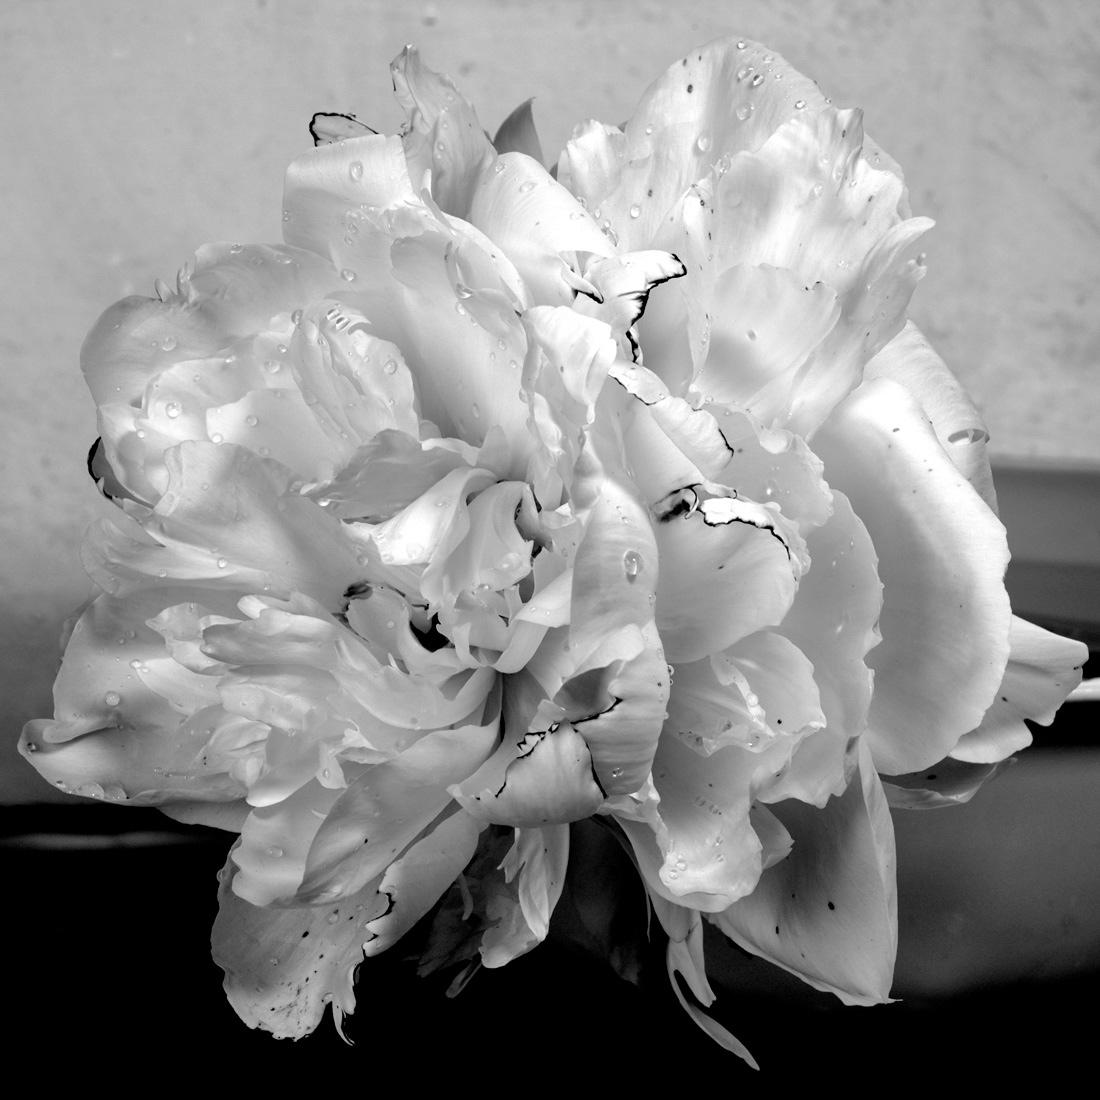 White Peony 5, 2018